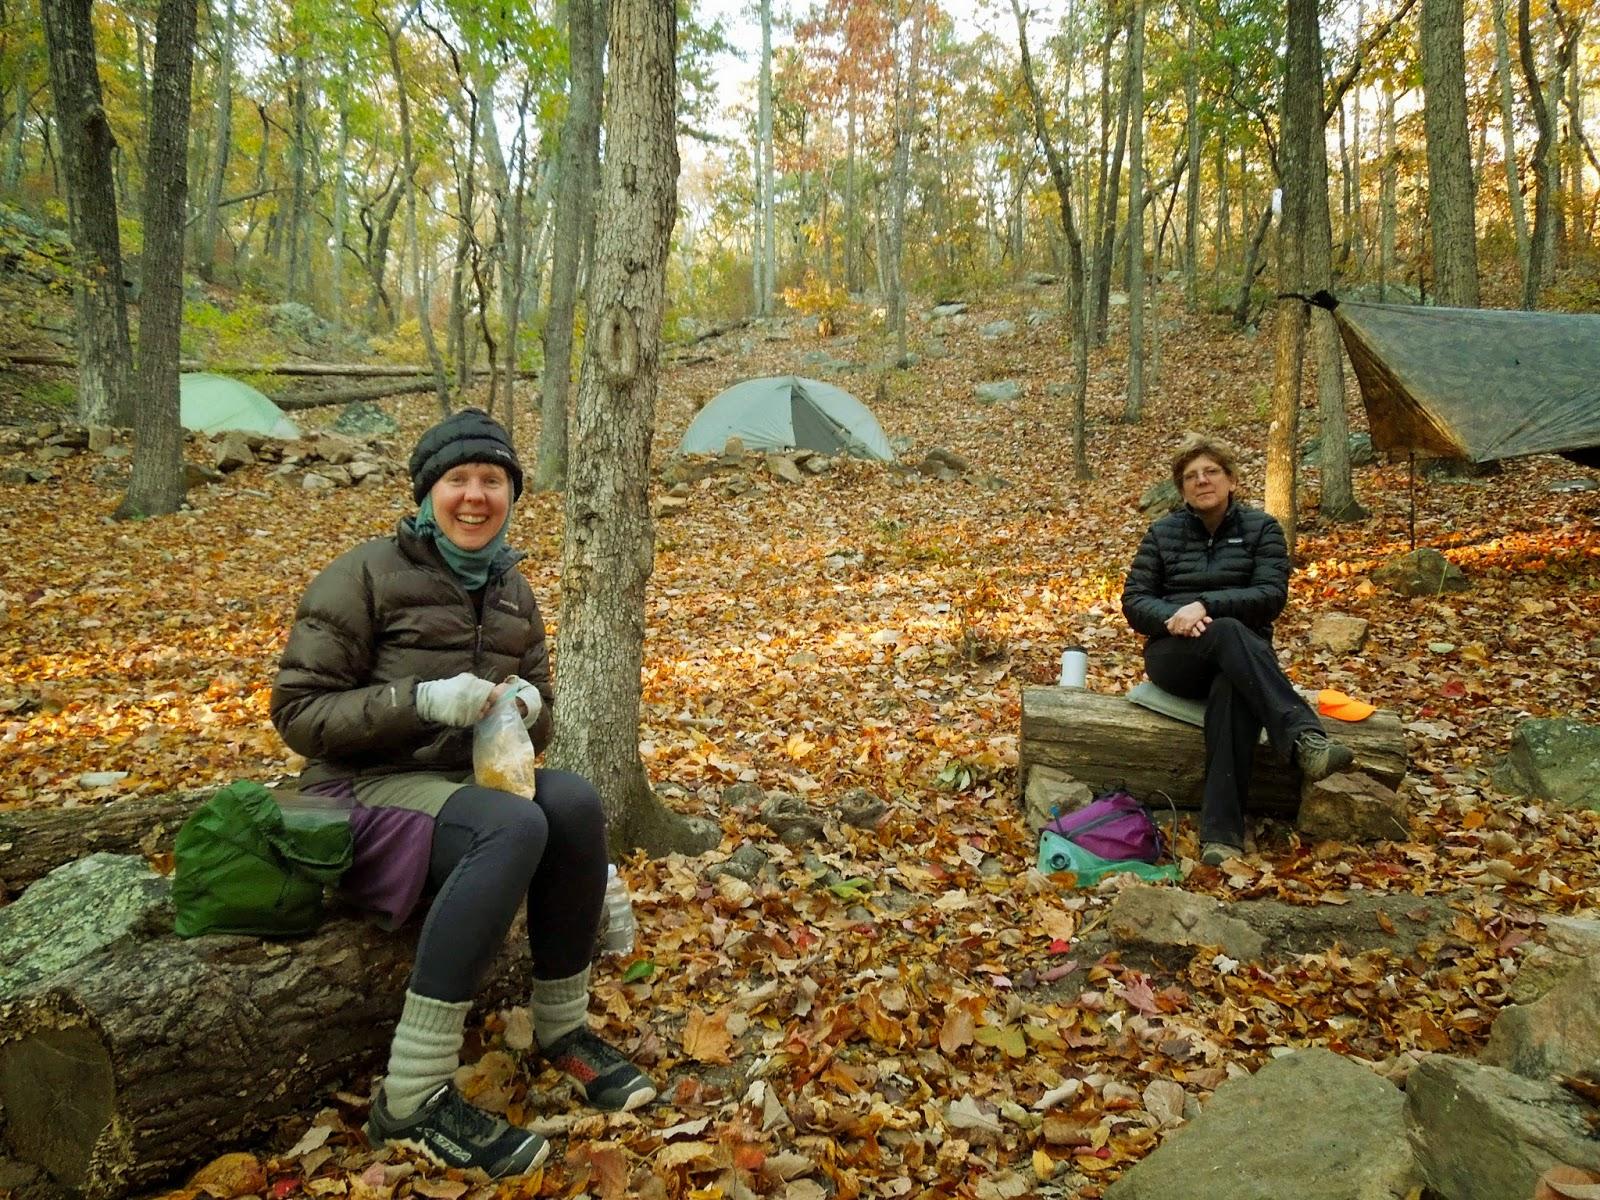 Rambling Hemlock Winter Backpacking At Fdr State Park